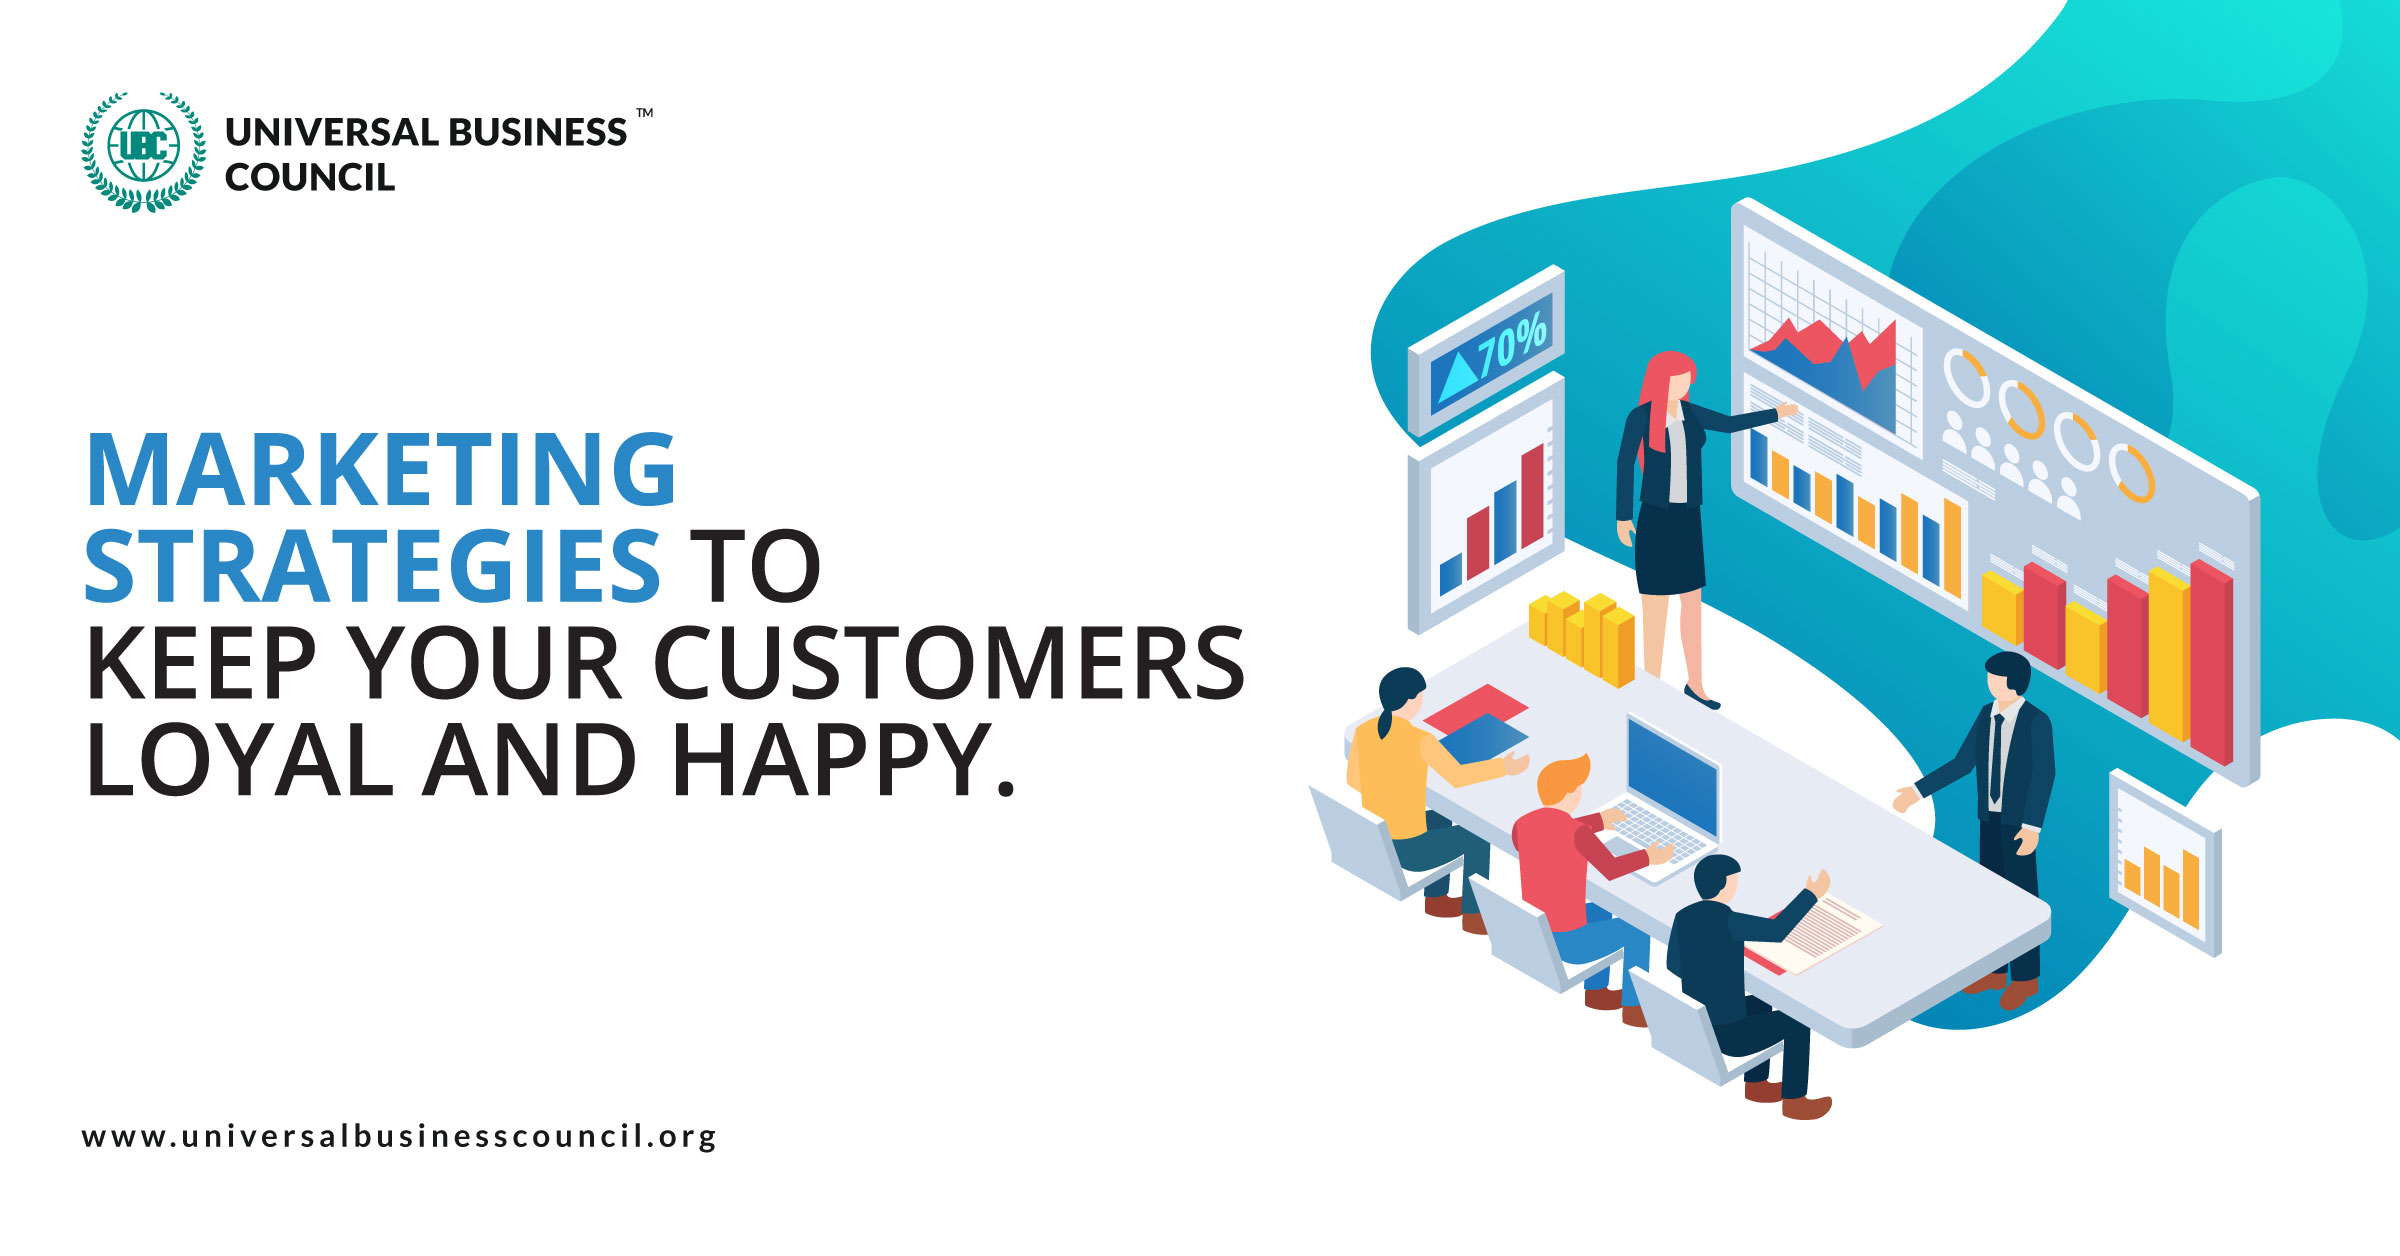 Marketing-StrategiesTo-Keep-Your-Customers-Loyal-and-Happy